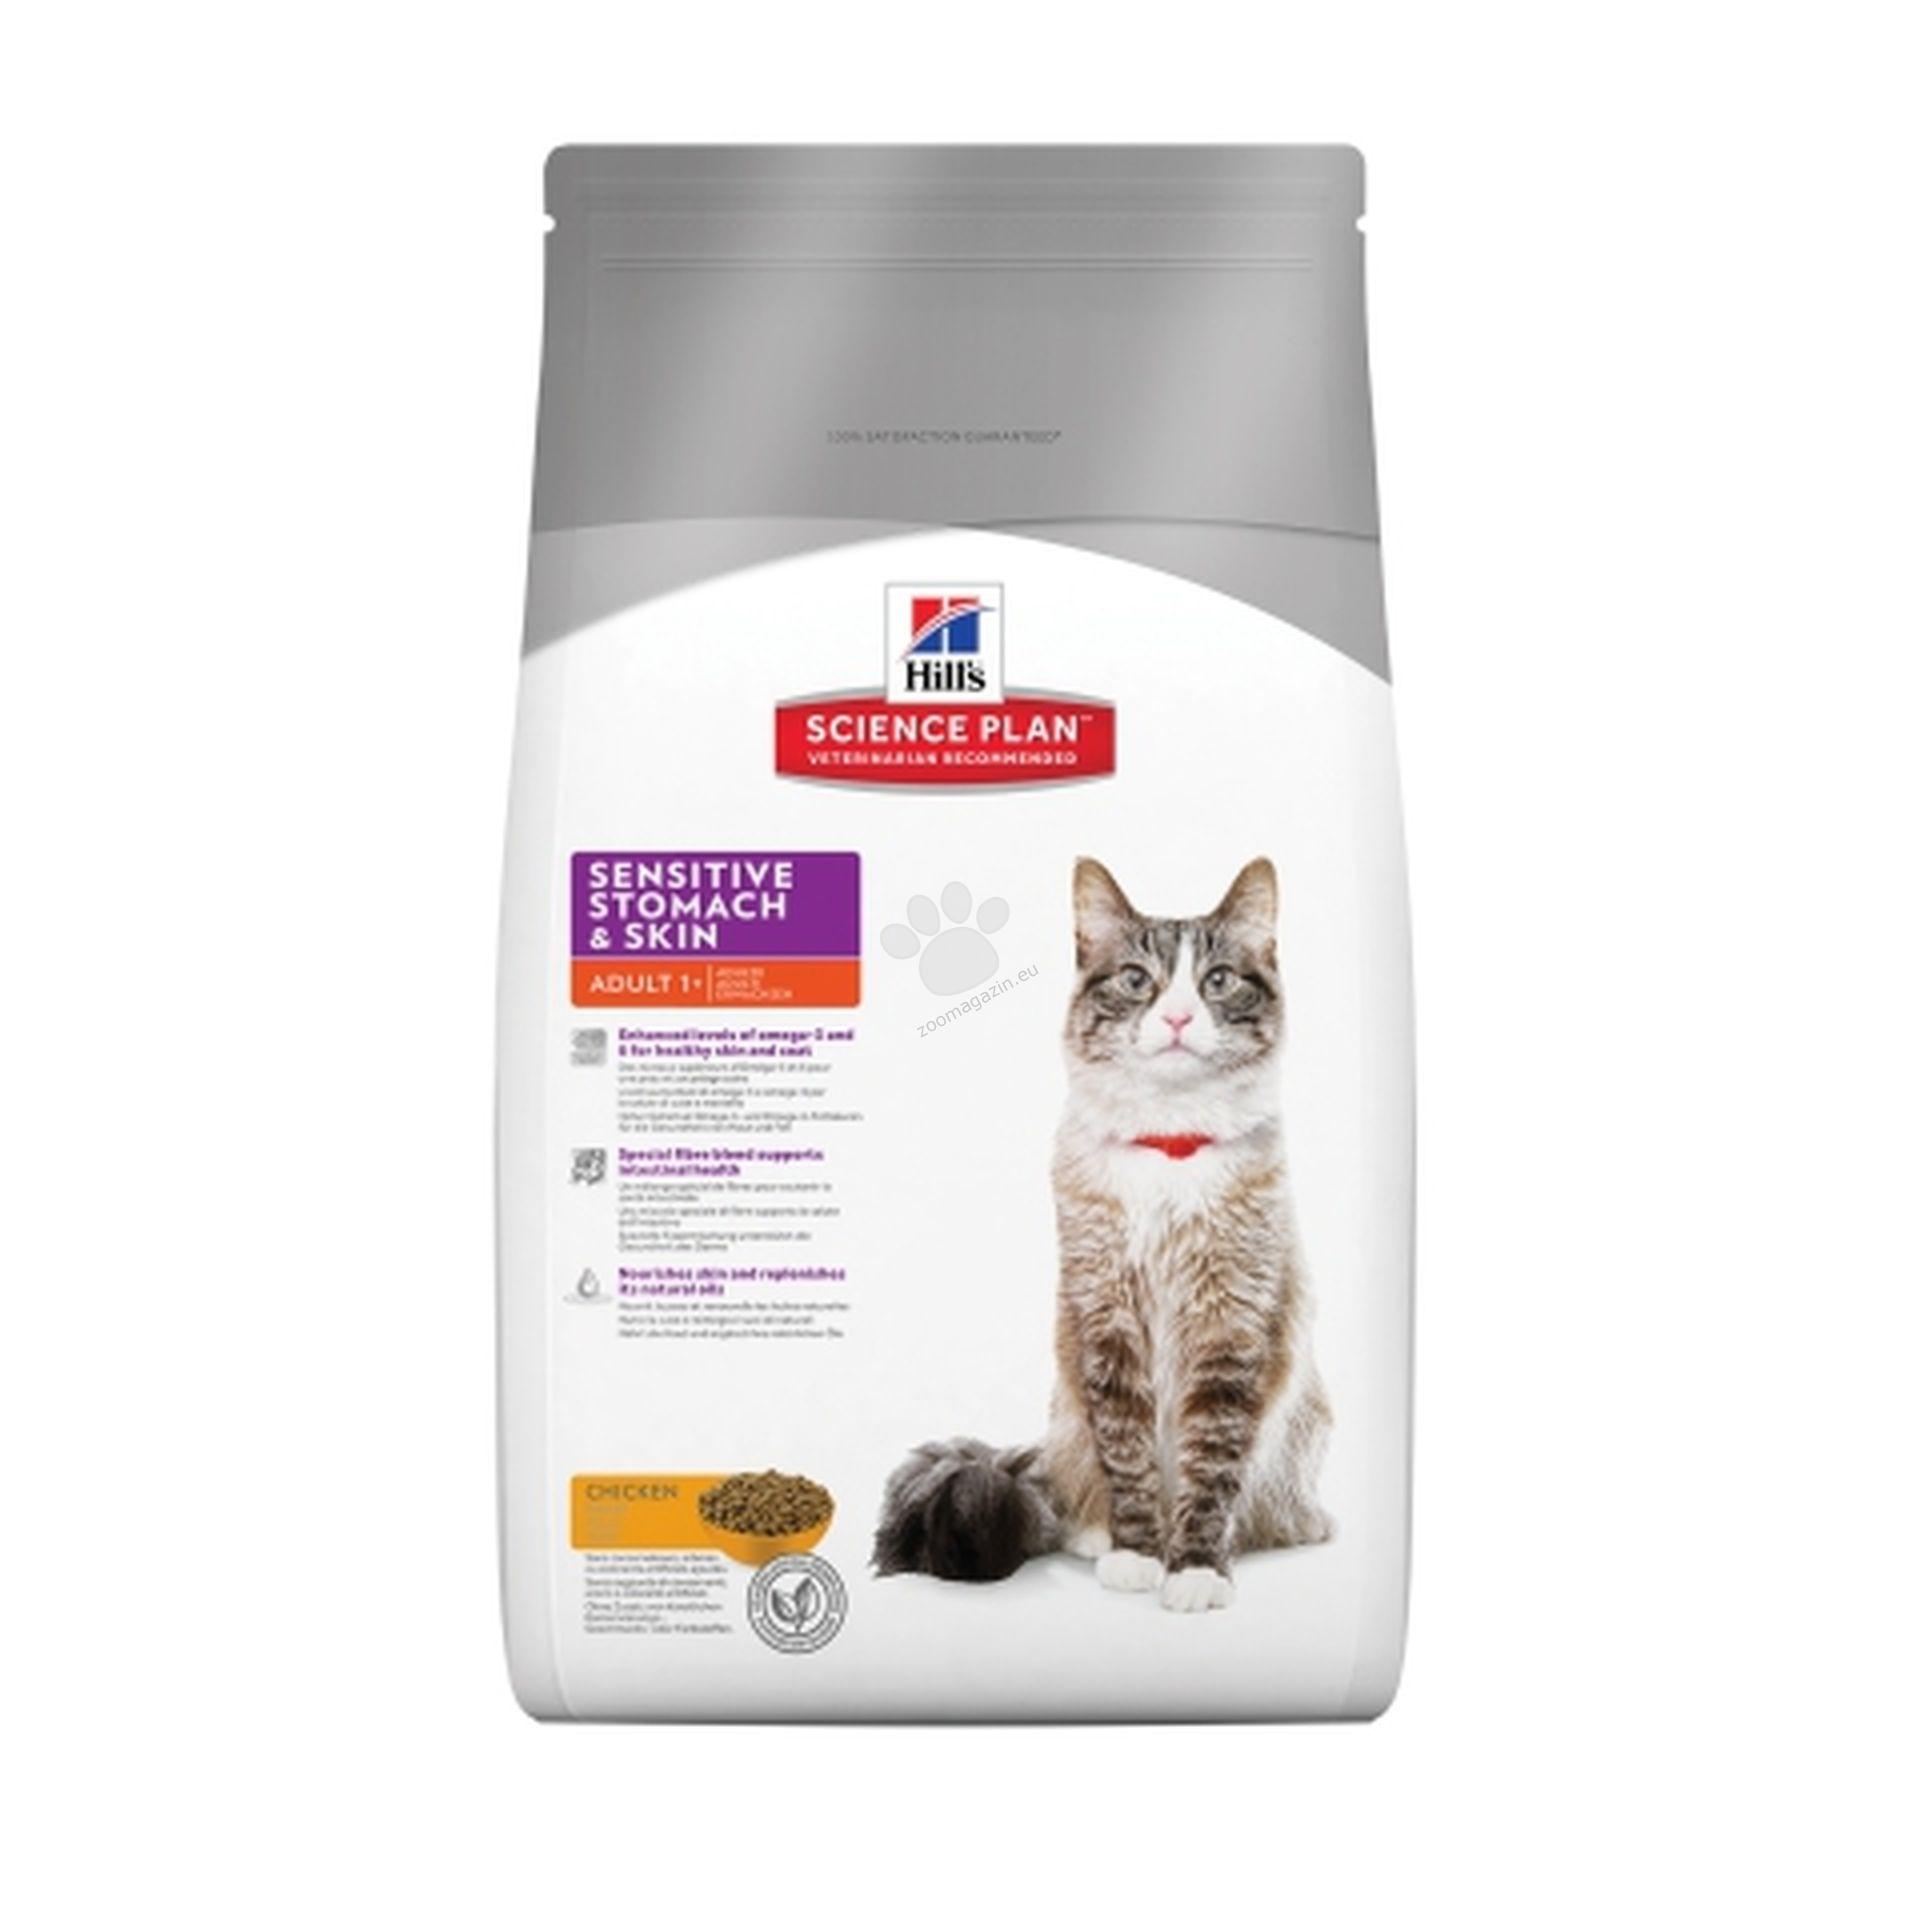 Science Plan Feline Sterilised Cat Adult Chicken - с пилешко месо - За млади кастрирани котки от 6 месеца до 6 години 8 кг. + ПОДАРЪК: 2 кутии x 12 пауча Sterilised FAVOURITE SELECTION